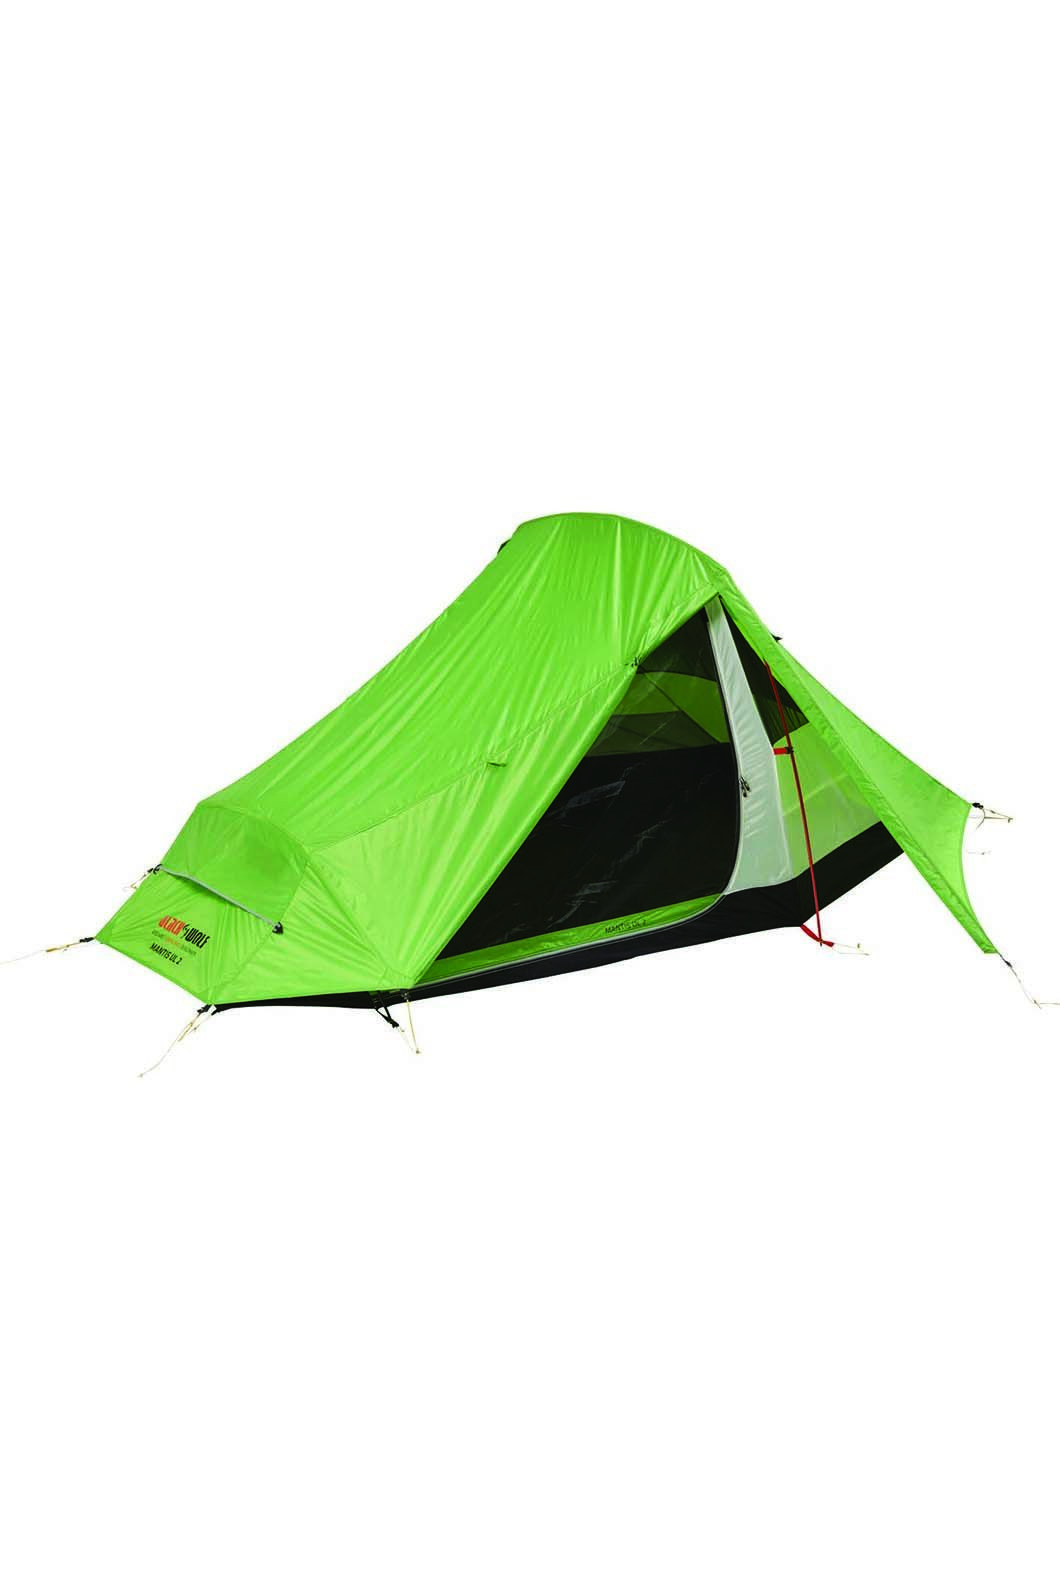 BlackWolf Mantis II 2 Person Hiking Tent, None, hi-res